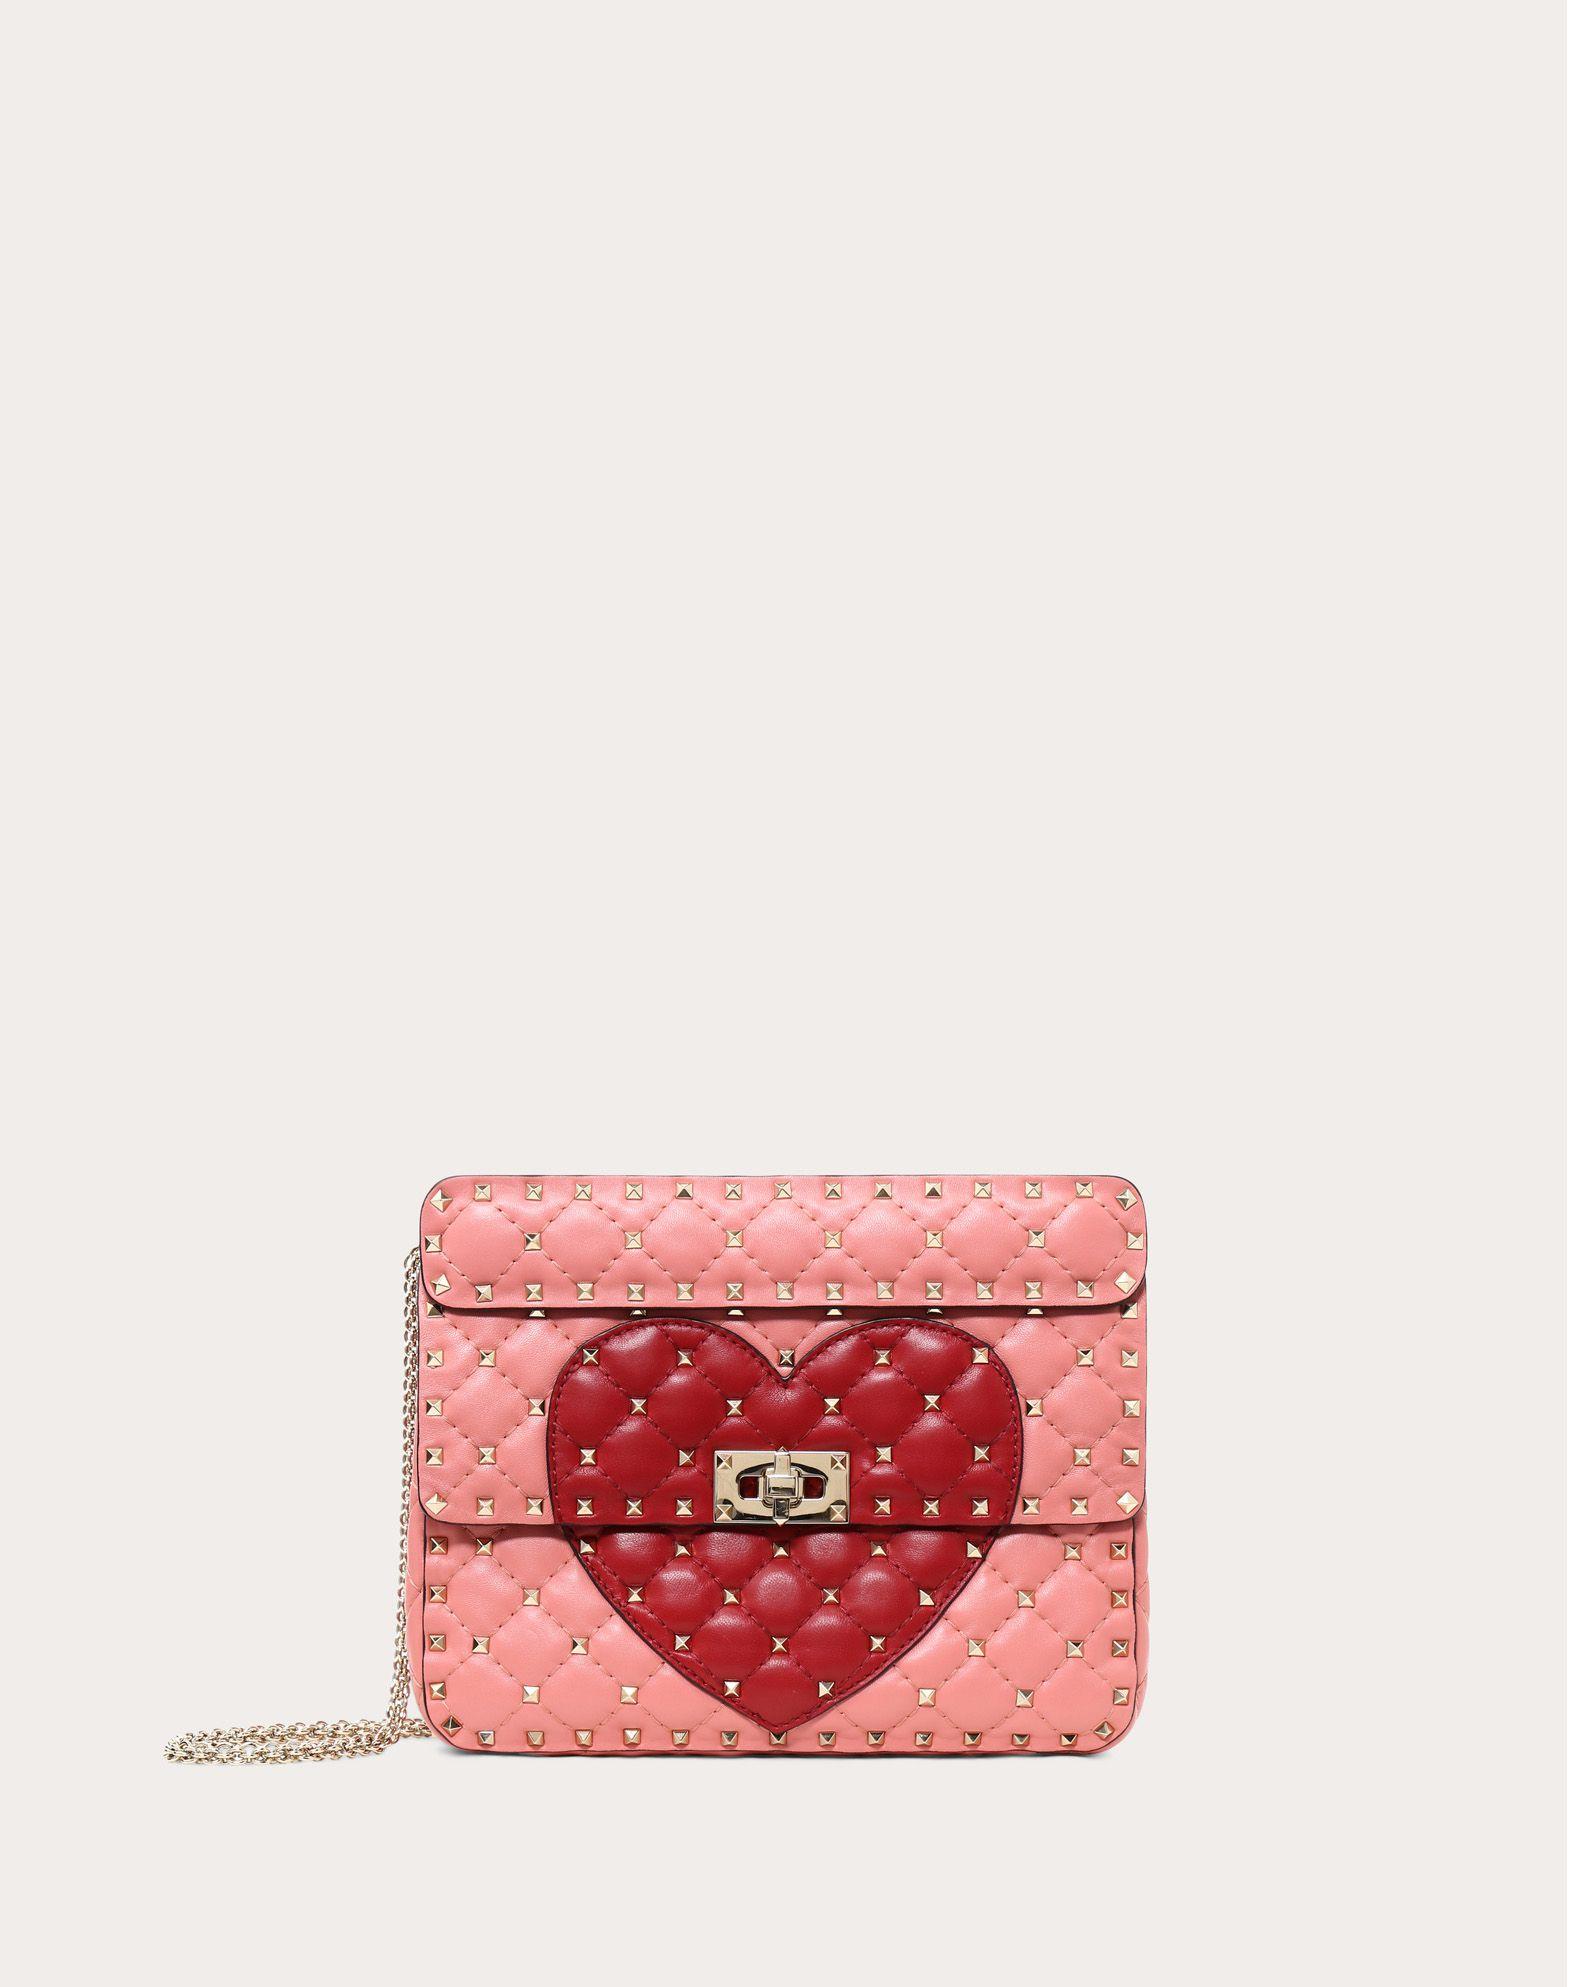 Valentino Garavani The Rockstud Two-tone Leather Shoulder Bag - Red Valentino GaJkJh24